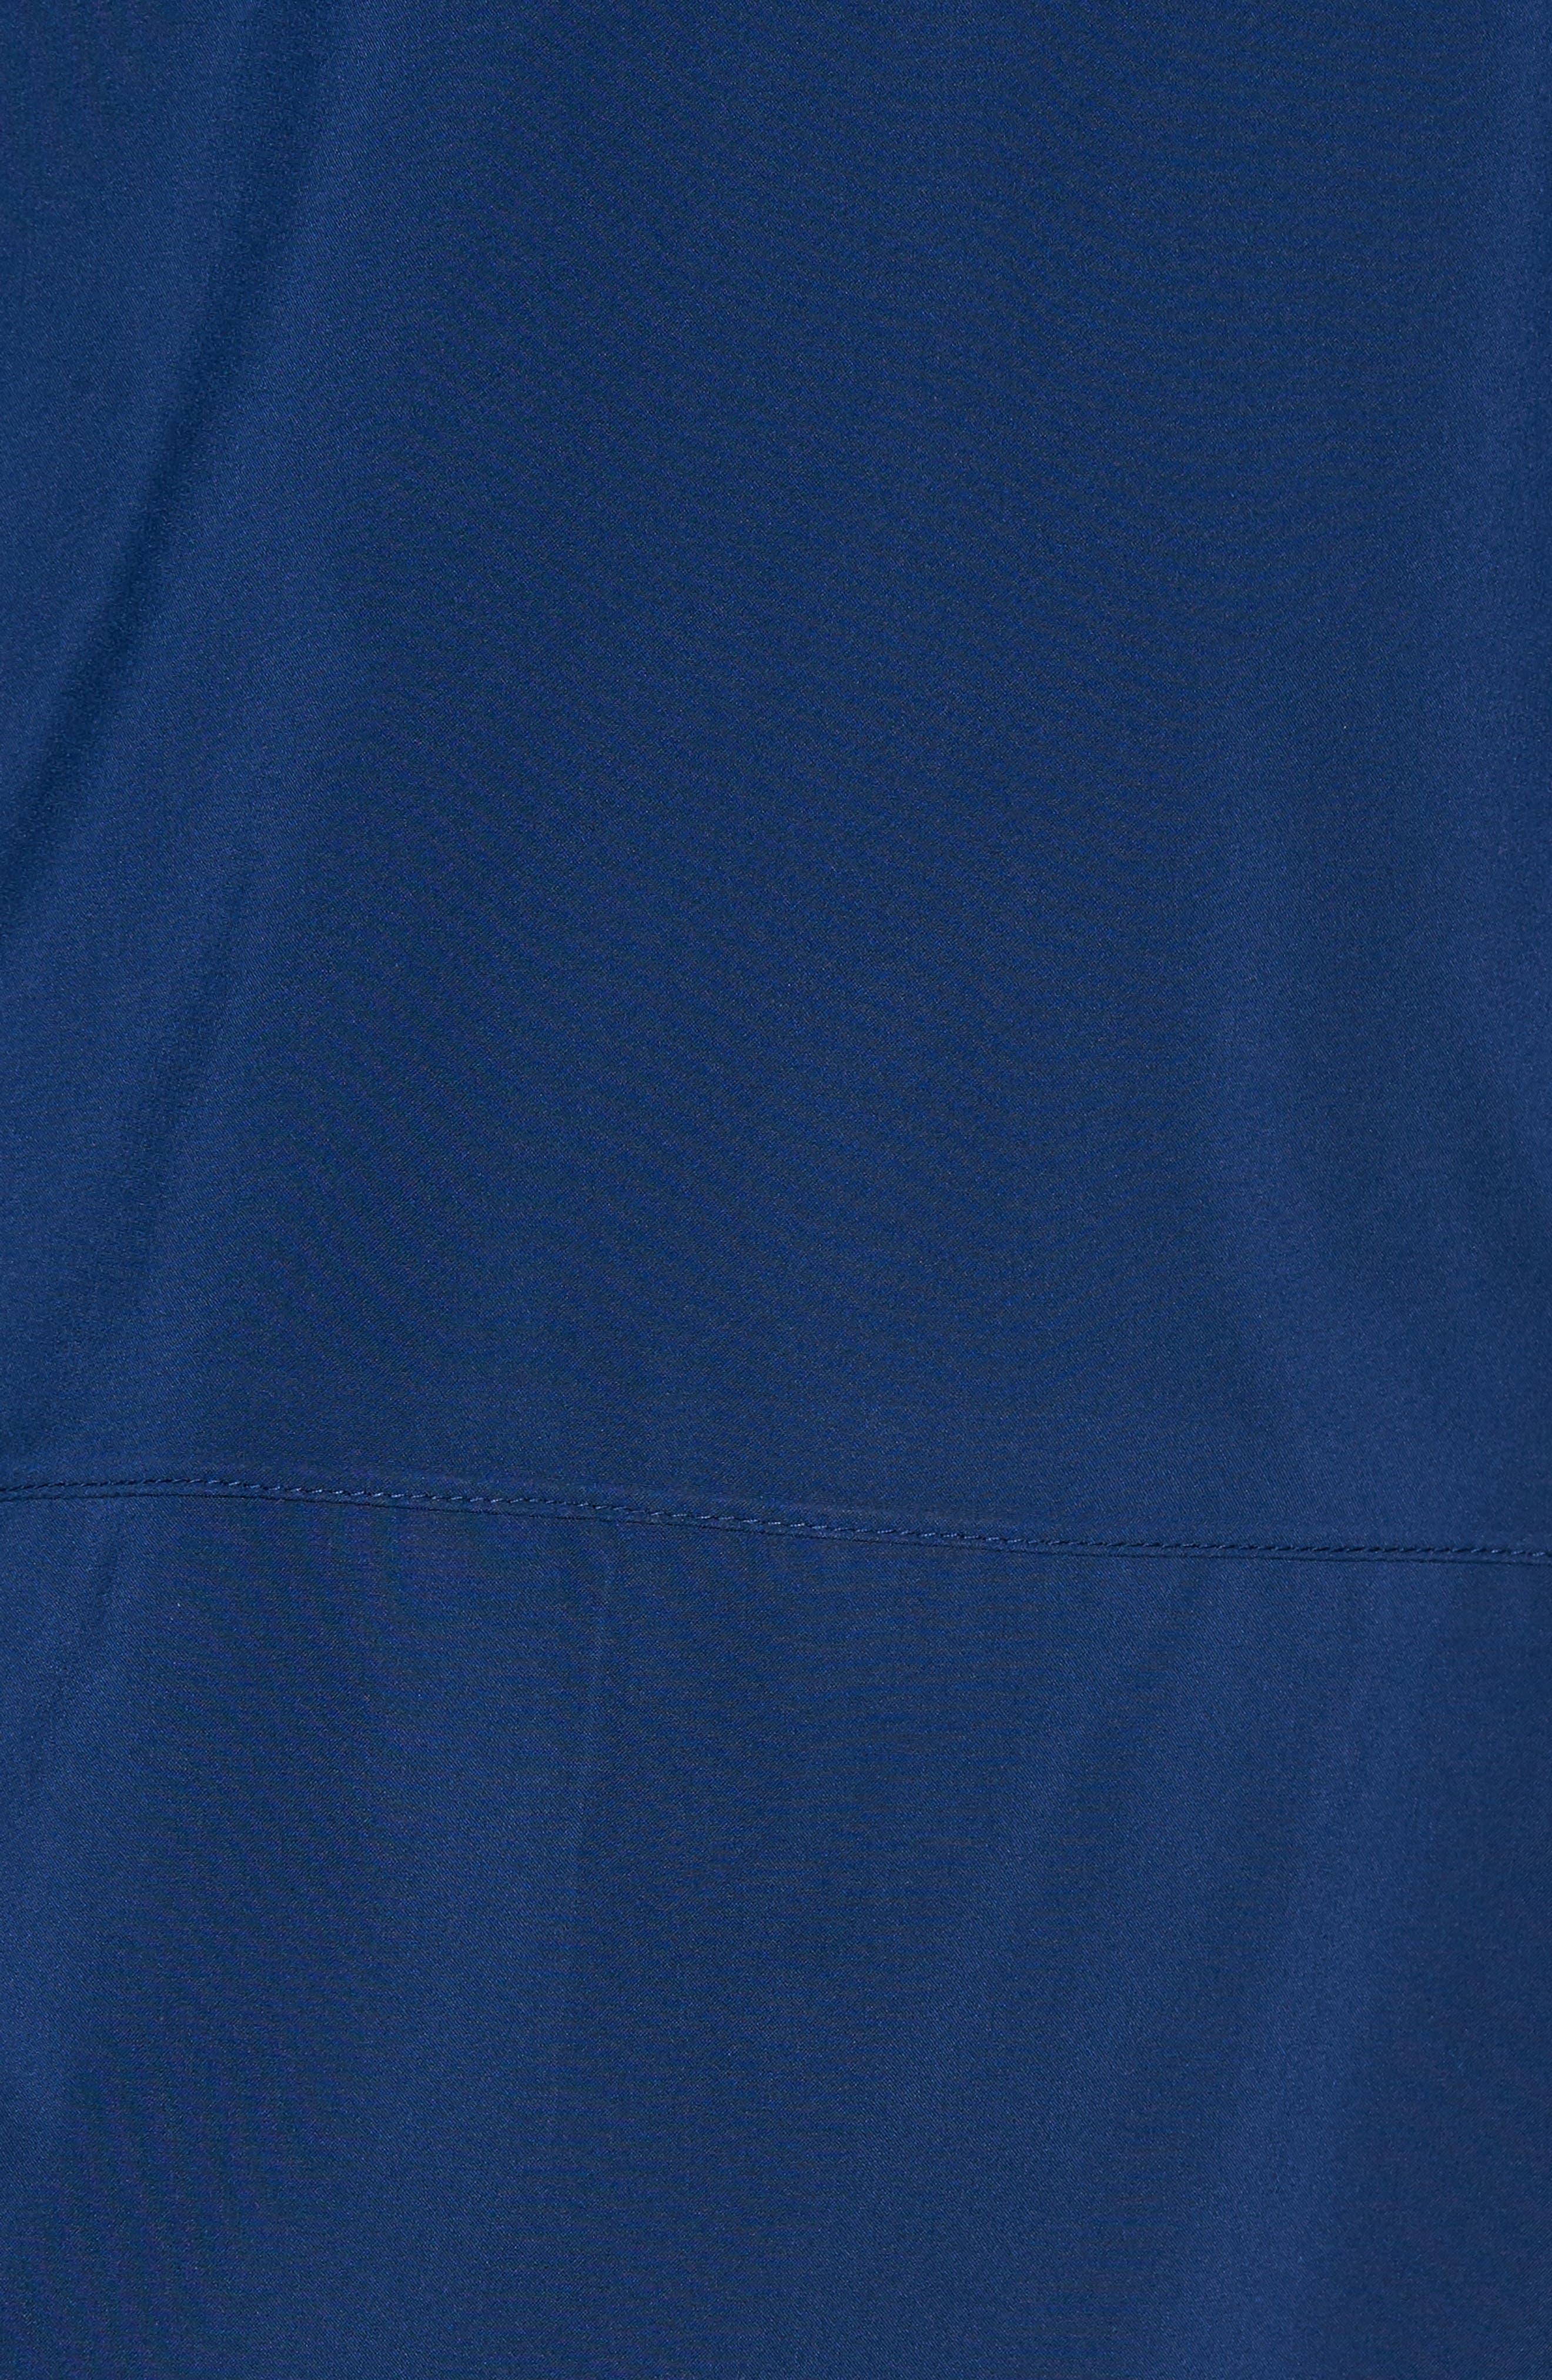 Regular Fit Half Zip Performance Pullover,                             Alternate thumbnail 5, color,                             Navy